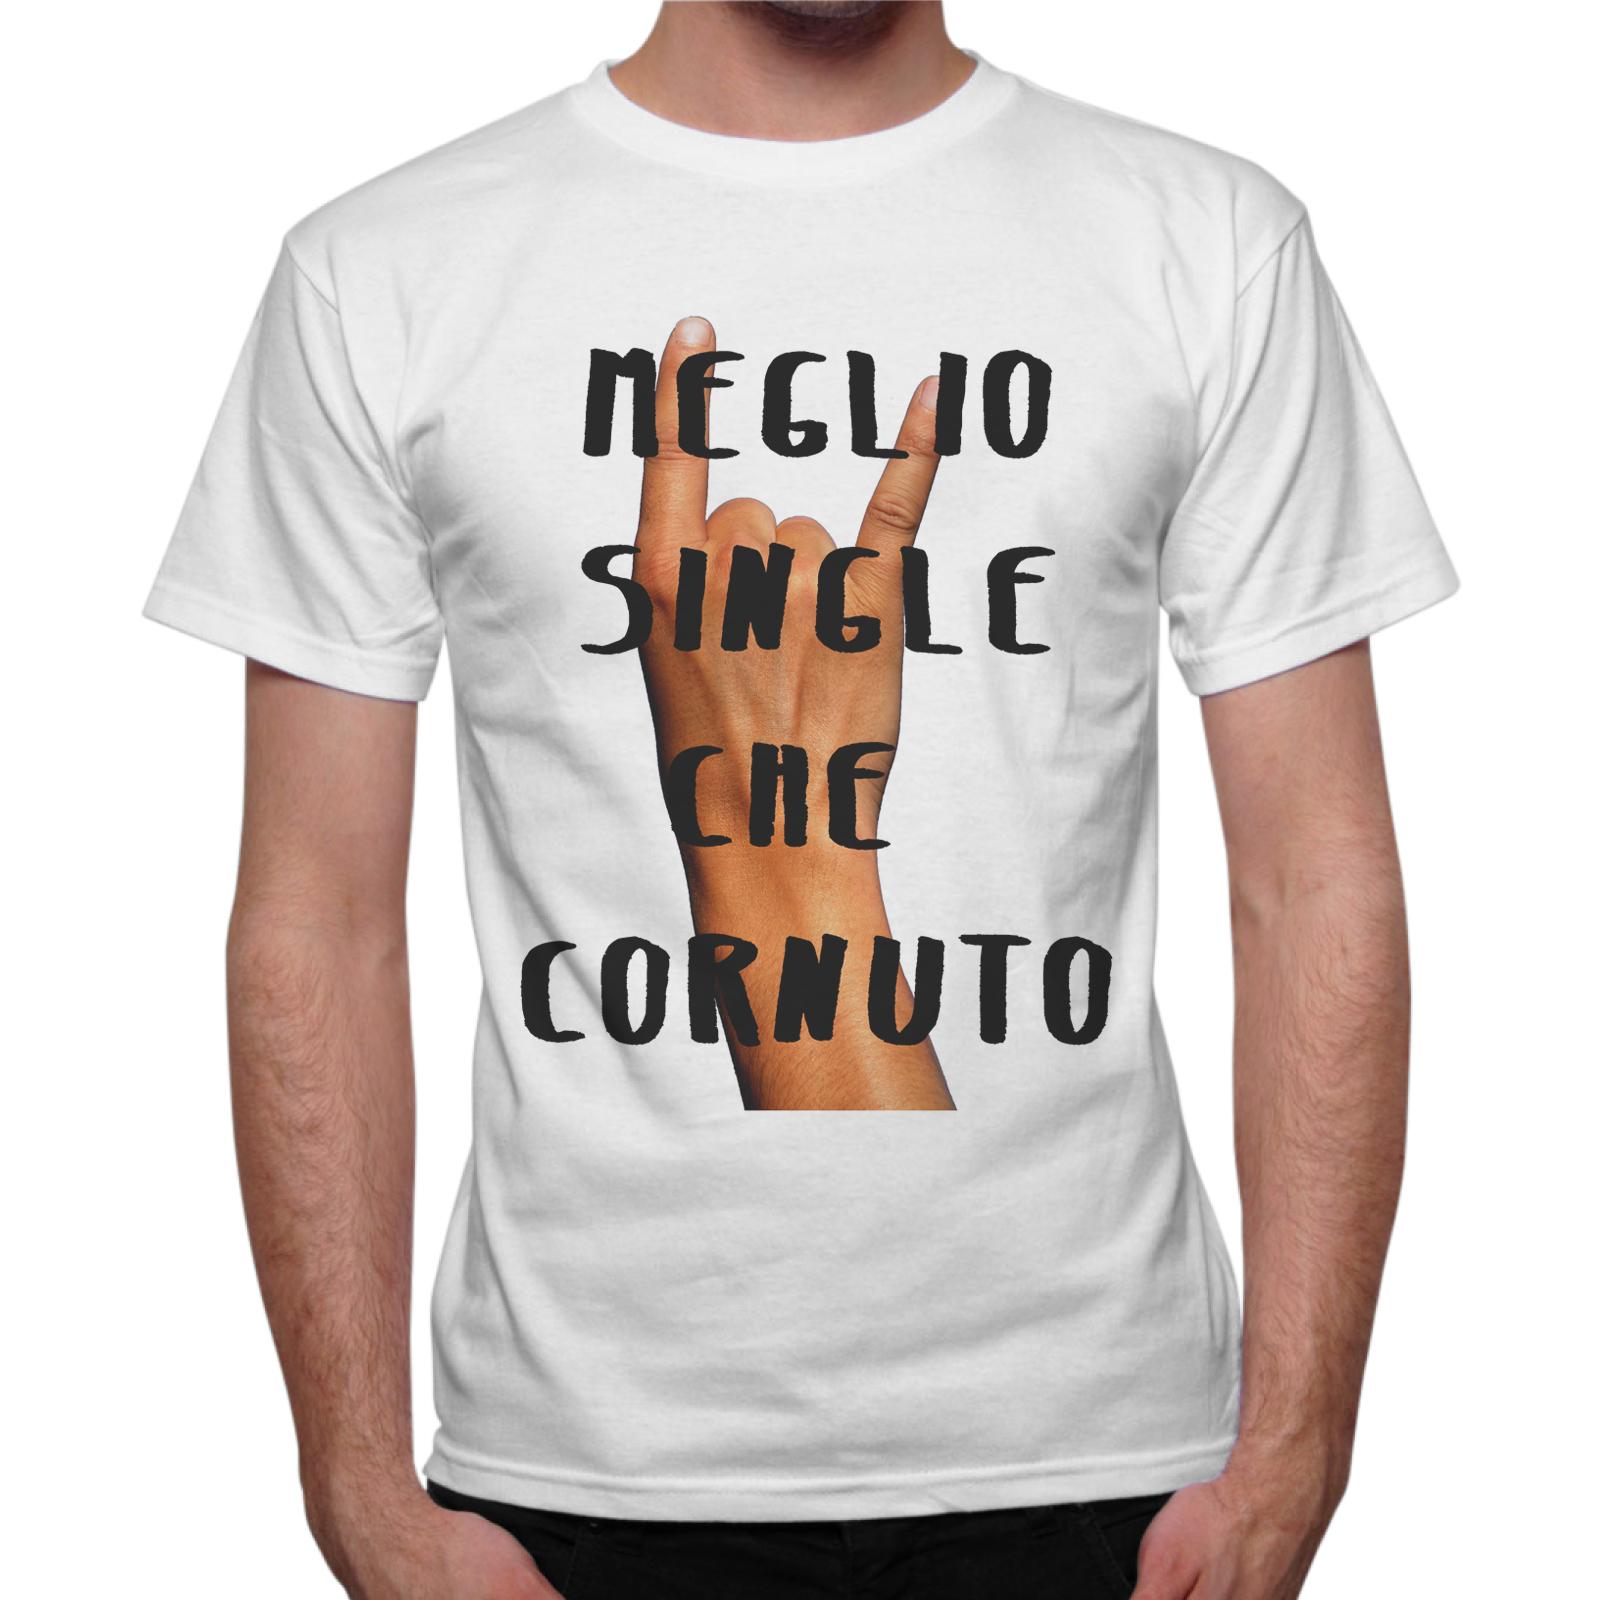 T-Shirt Uomo MEGLIO SINGLE